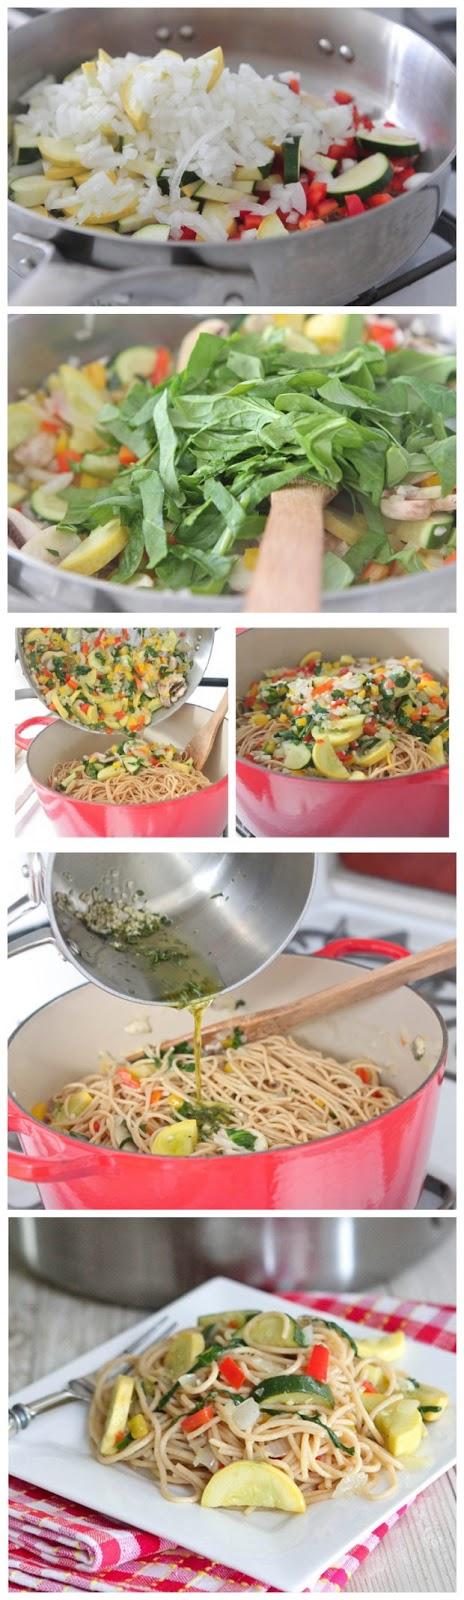 Spaghetti with Warm Garlic Thyme Olive Oil